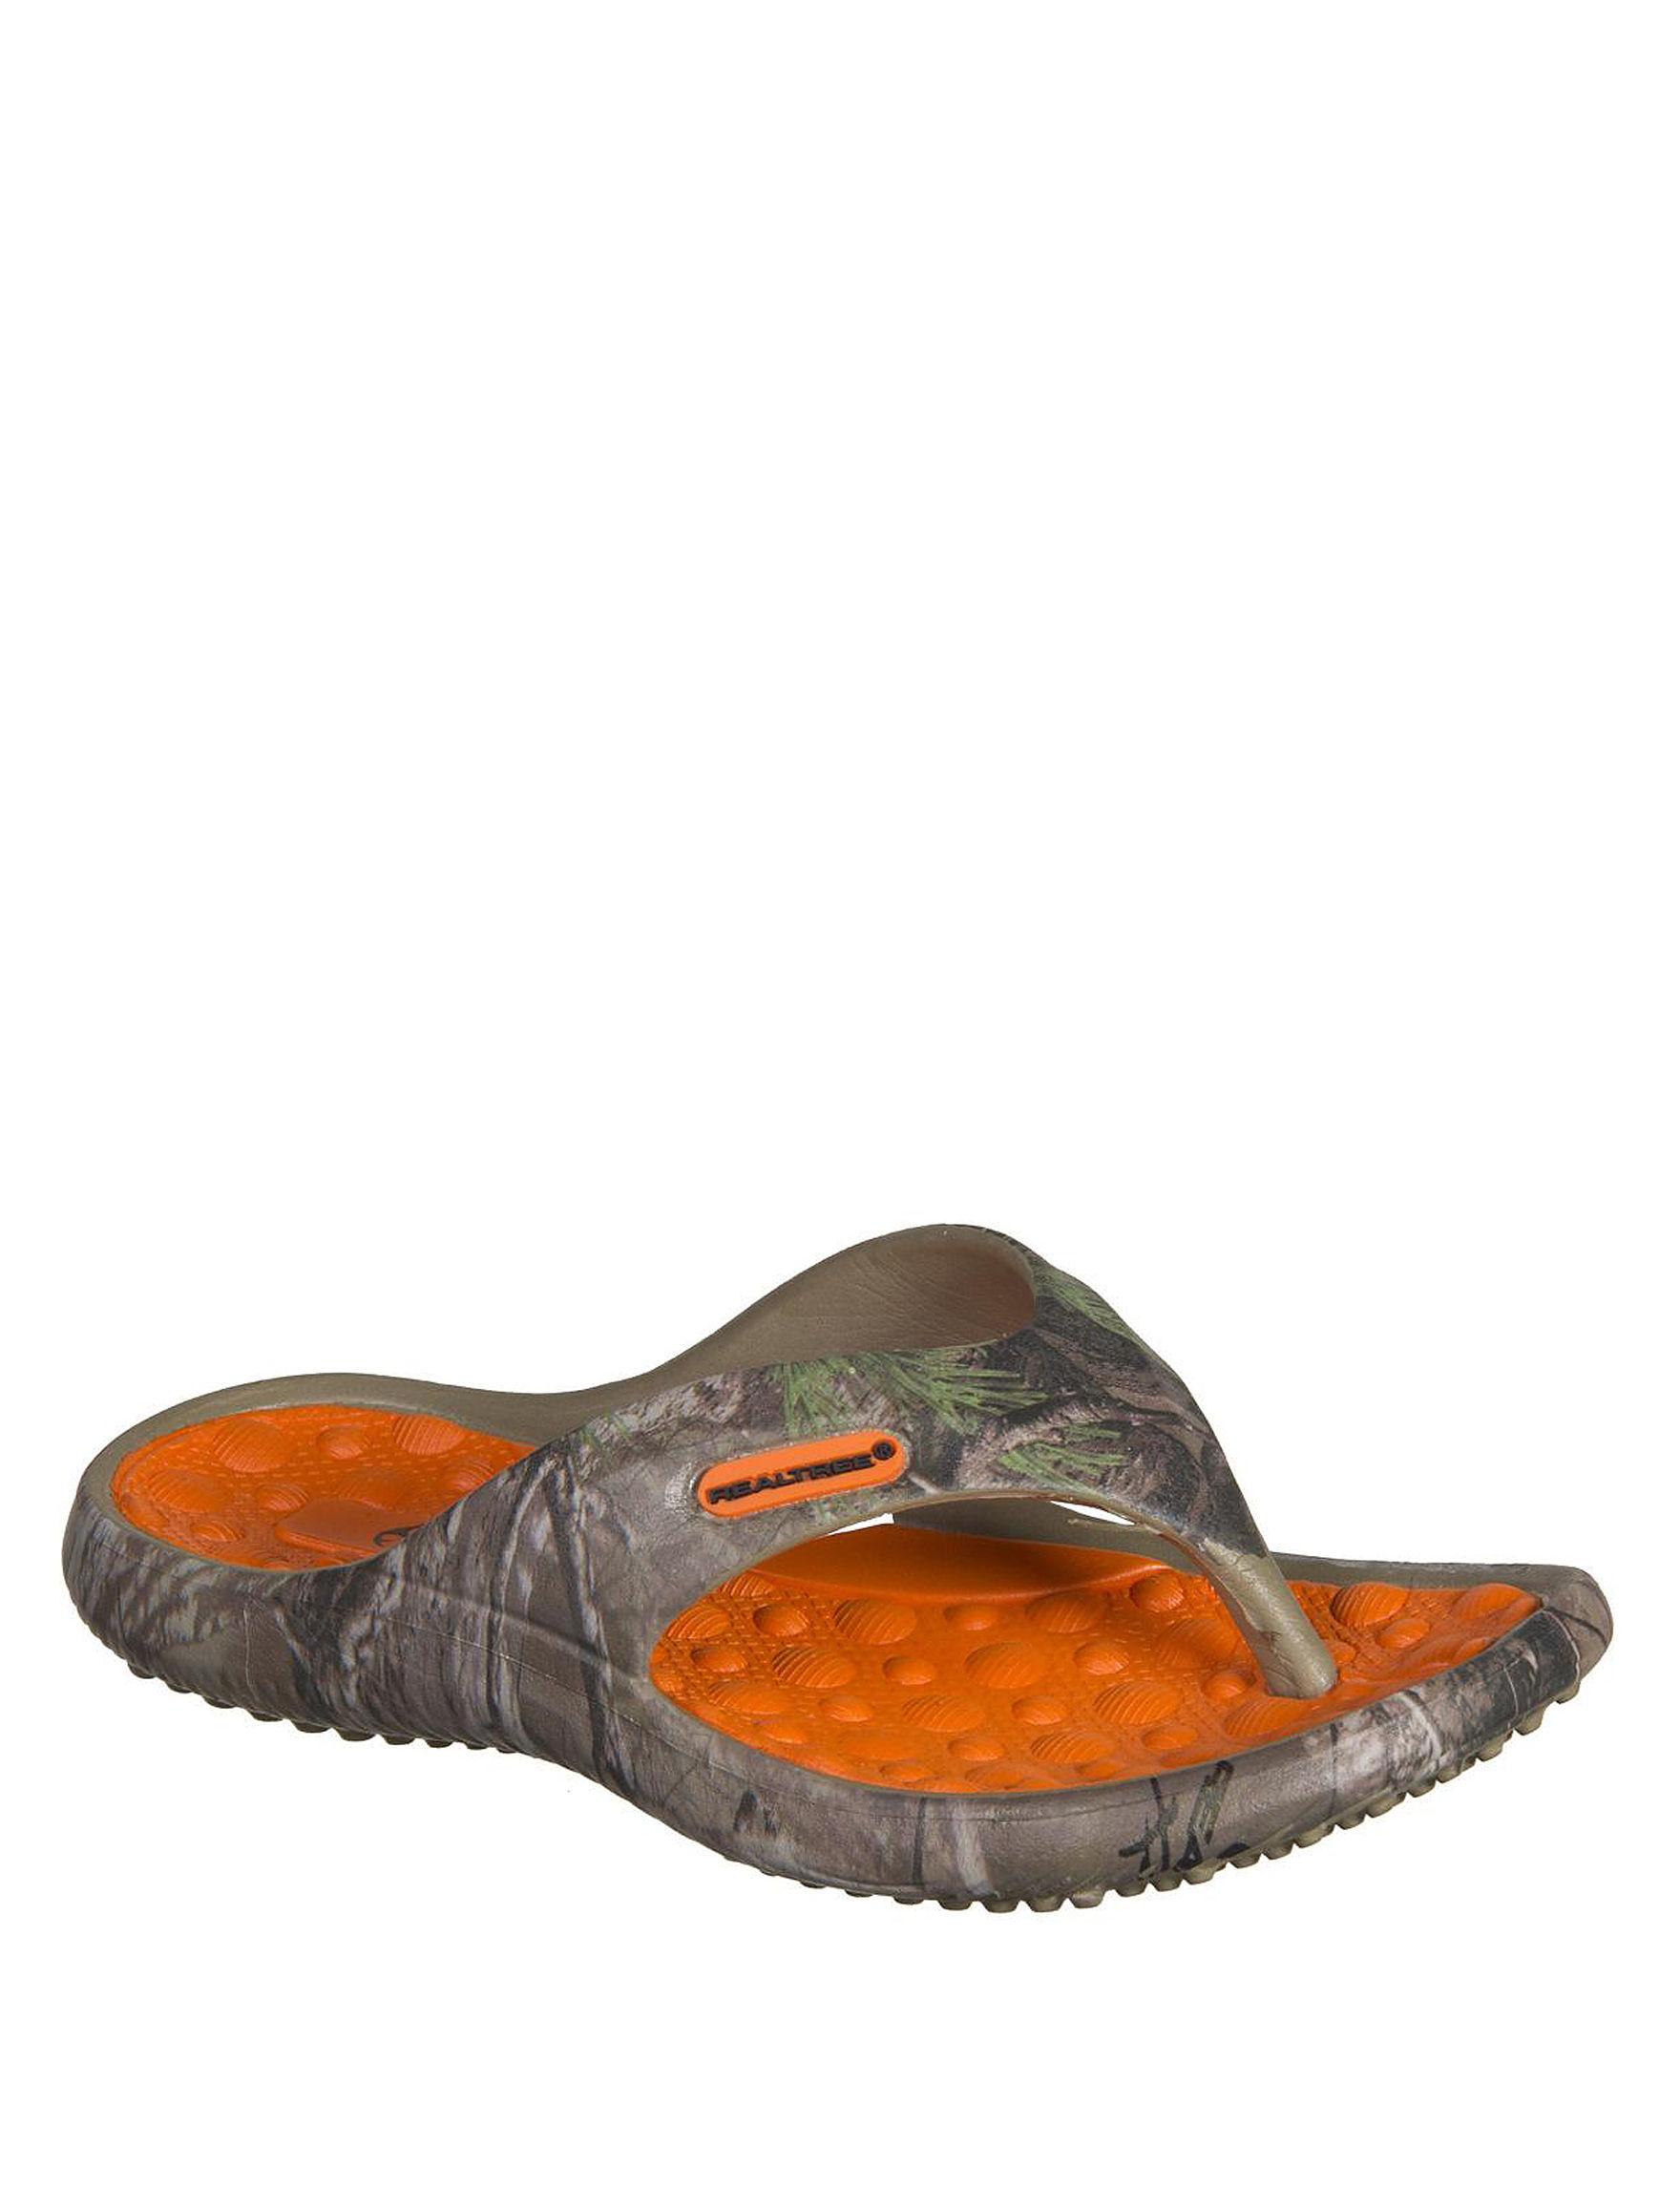 Realtree Camo Flip Flops